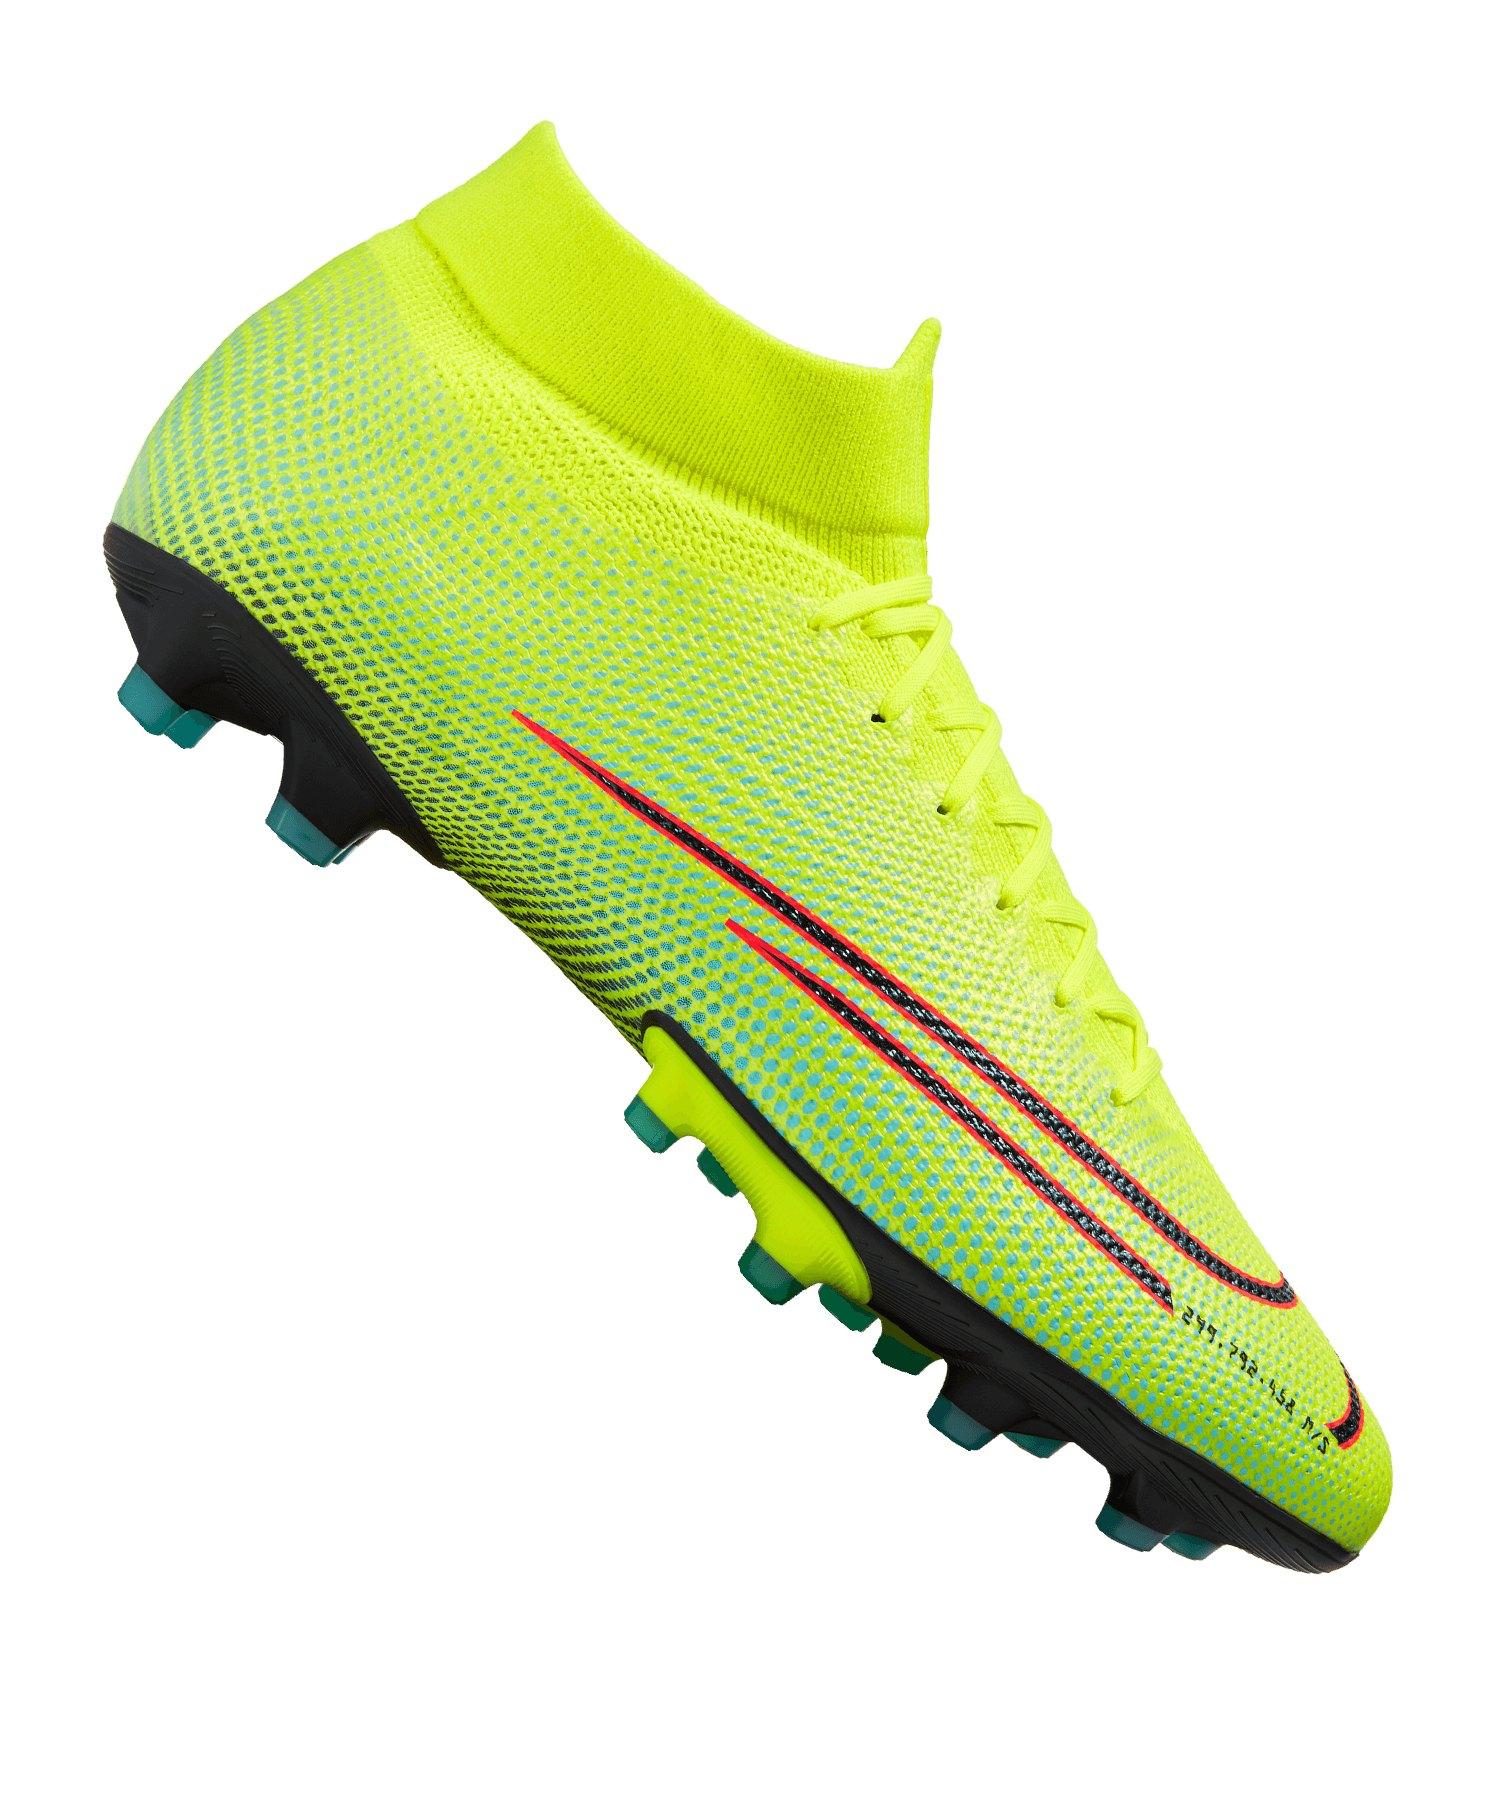 Nike Mercurial Superfly VII Dreamspeed Pro AG-Pro Gelb F703 - gelb